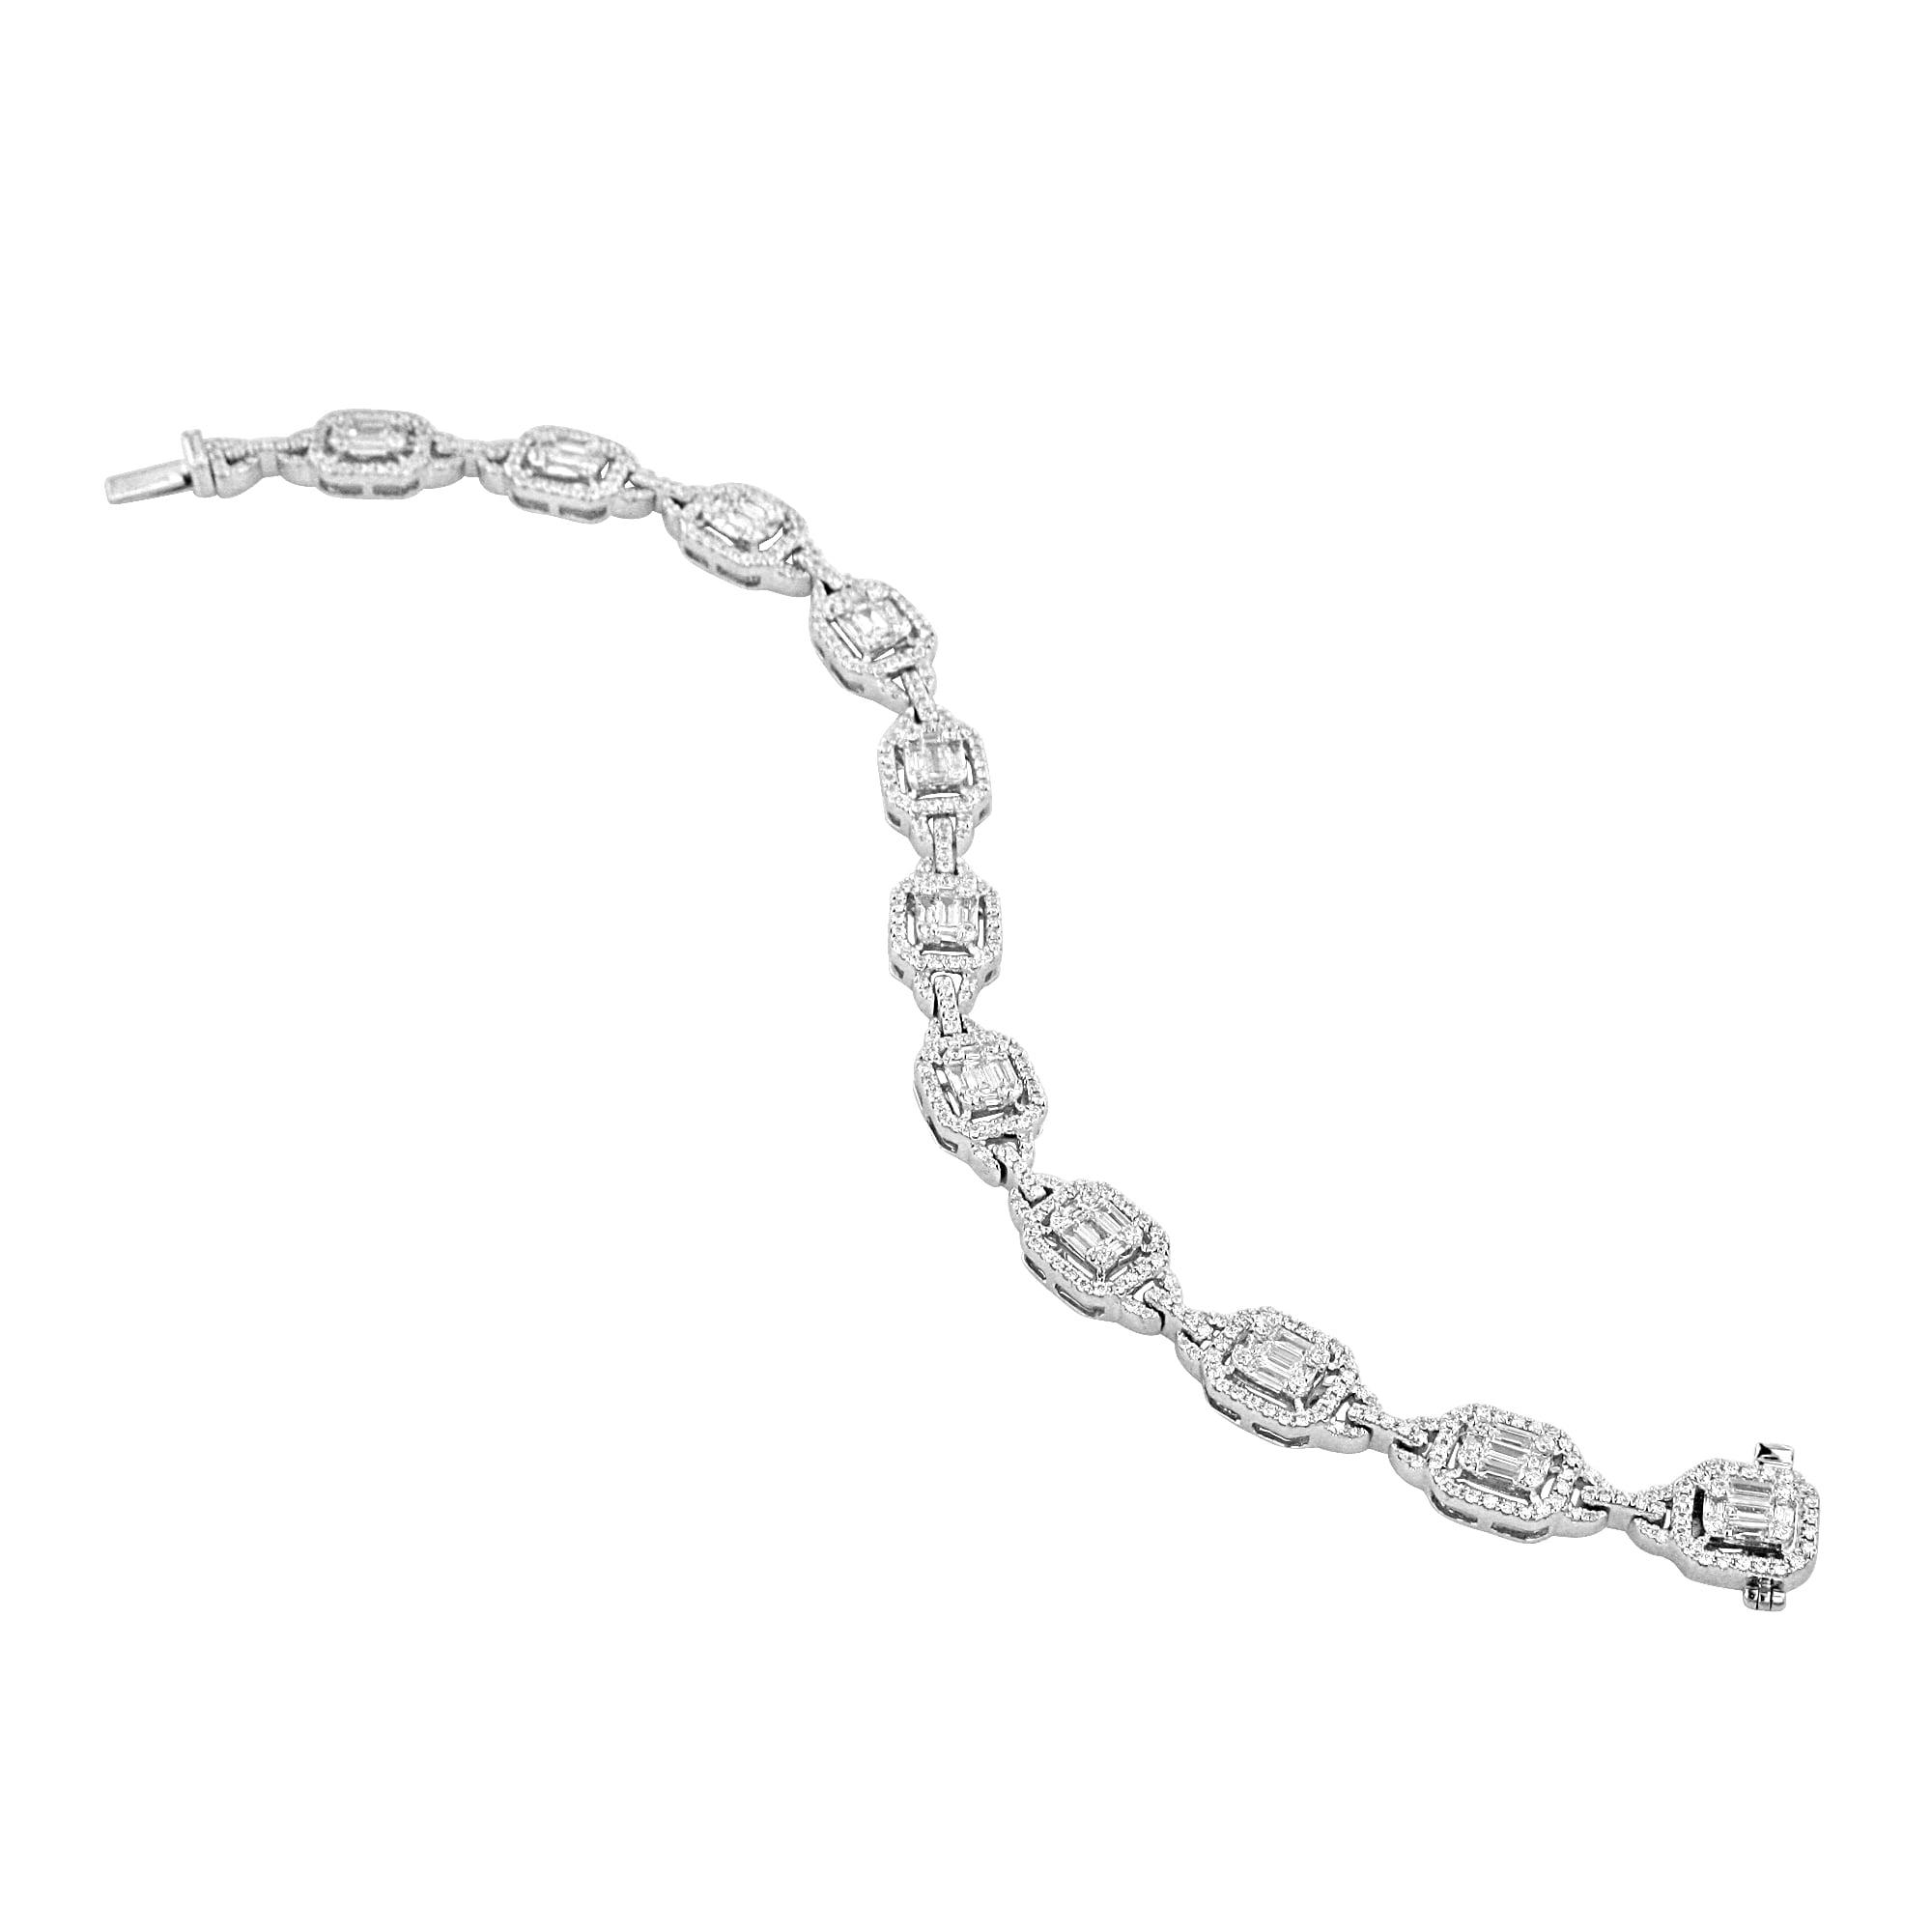 aed4efd9b 3.26ct Vintage Inspired Diamond Bracelet - Womens from Avanti of Ashbourne  Ltd UK